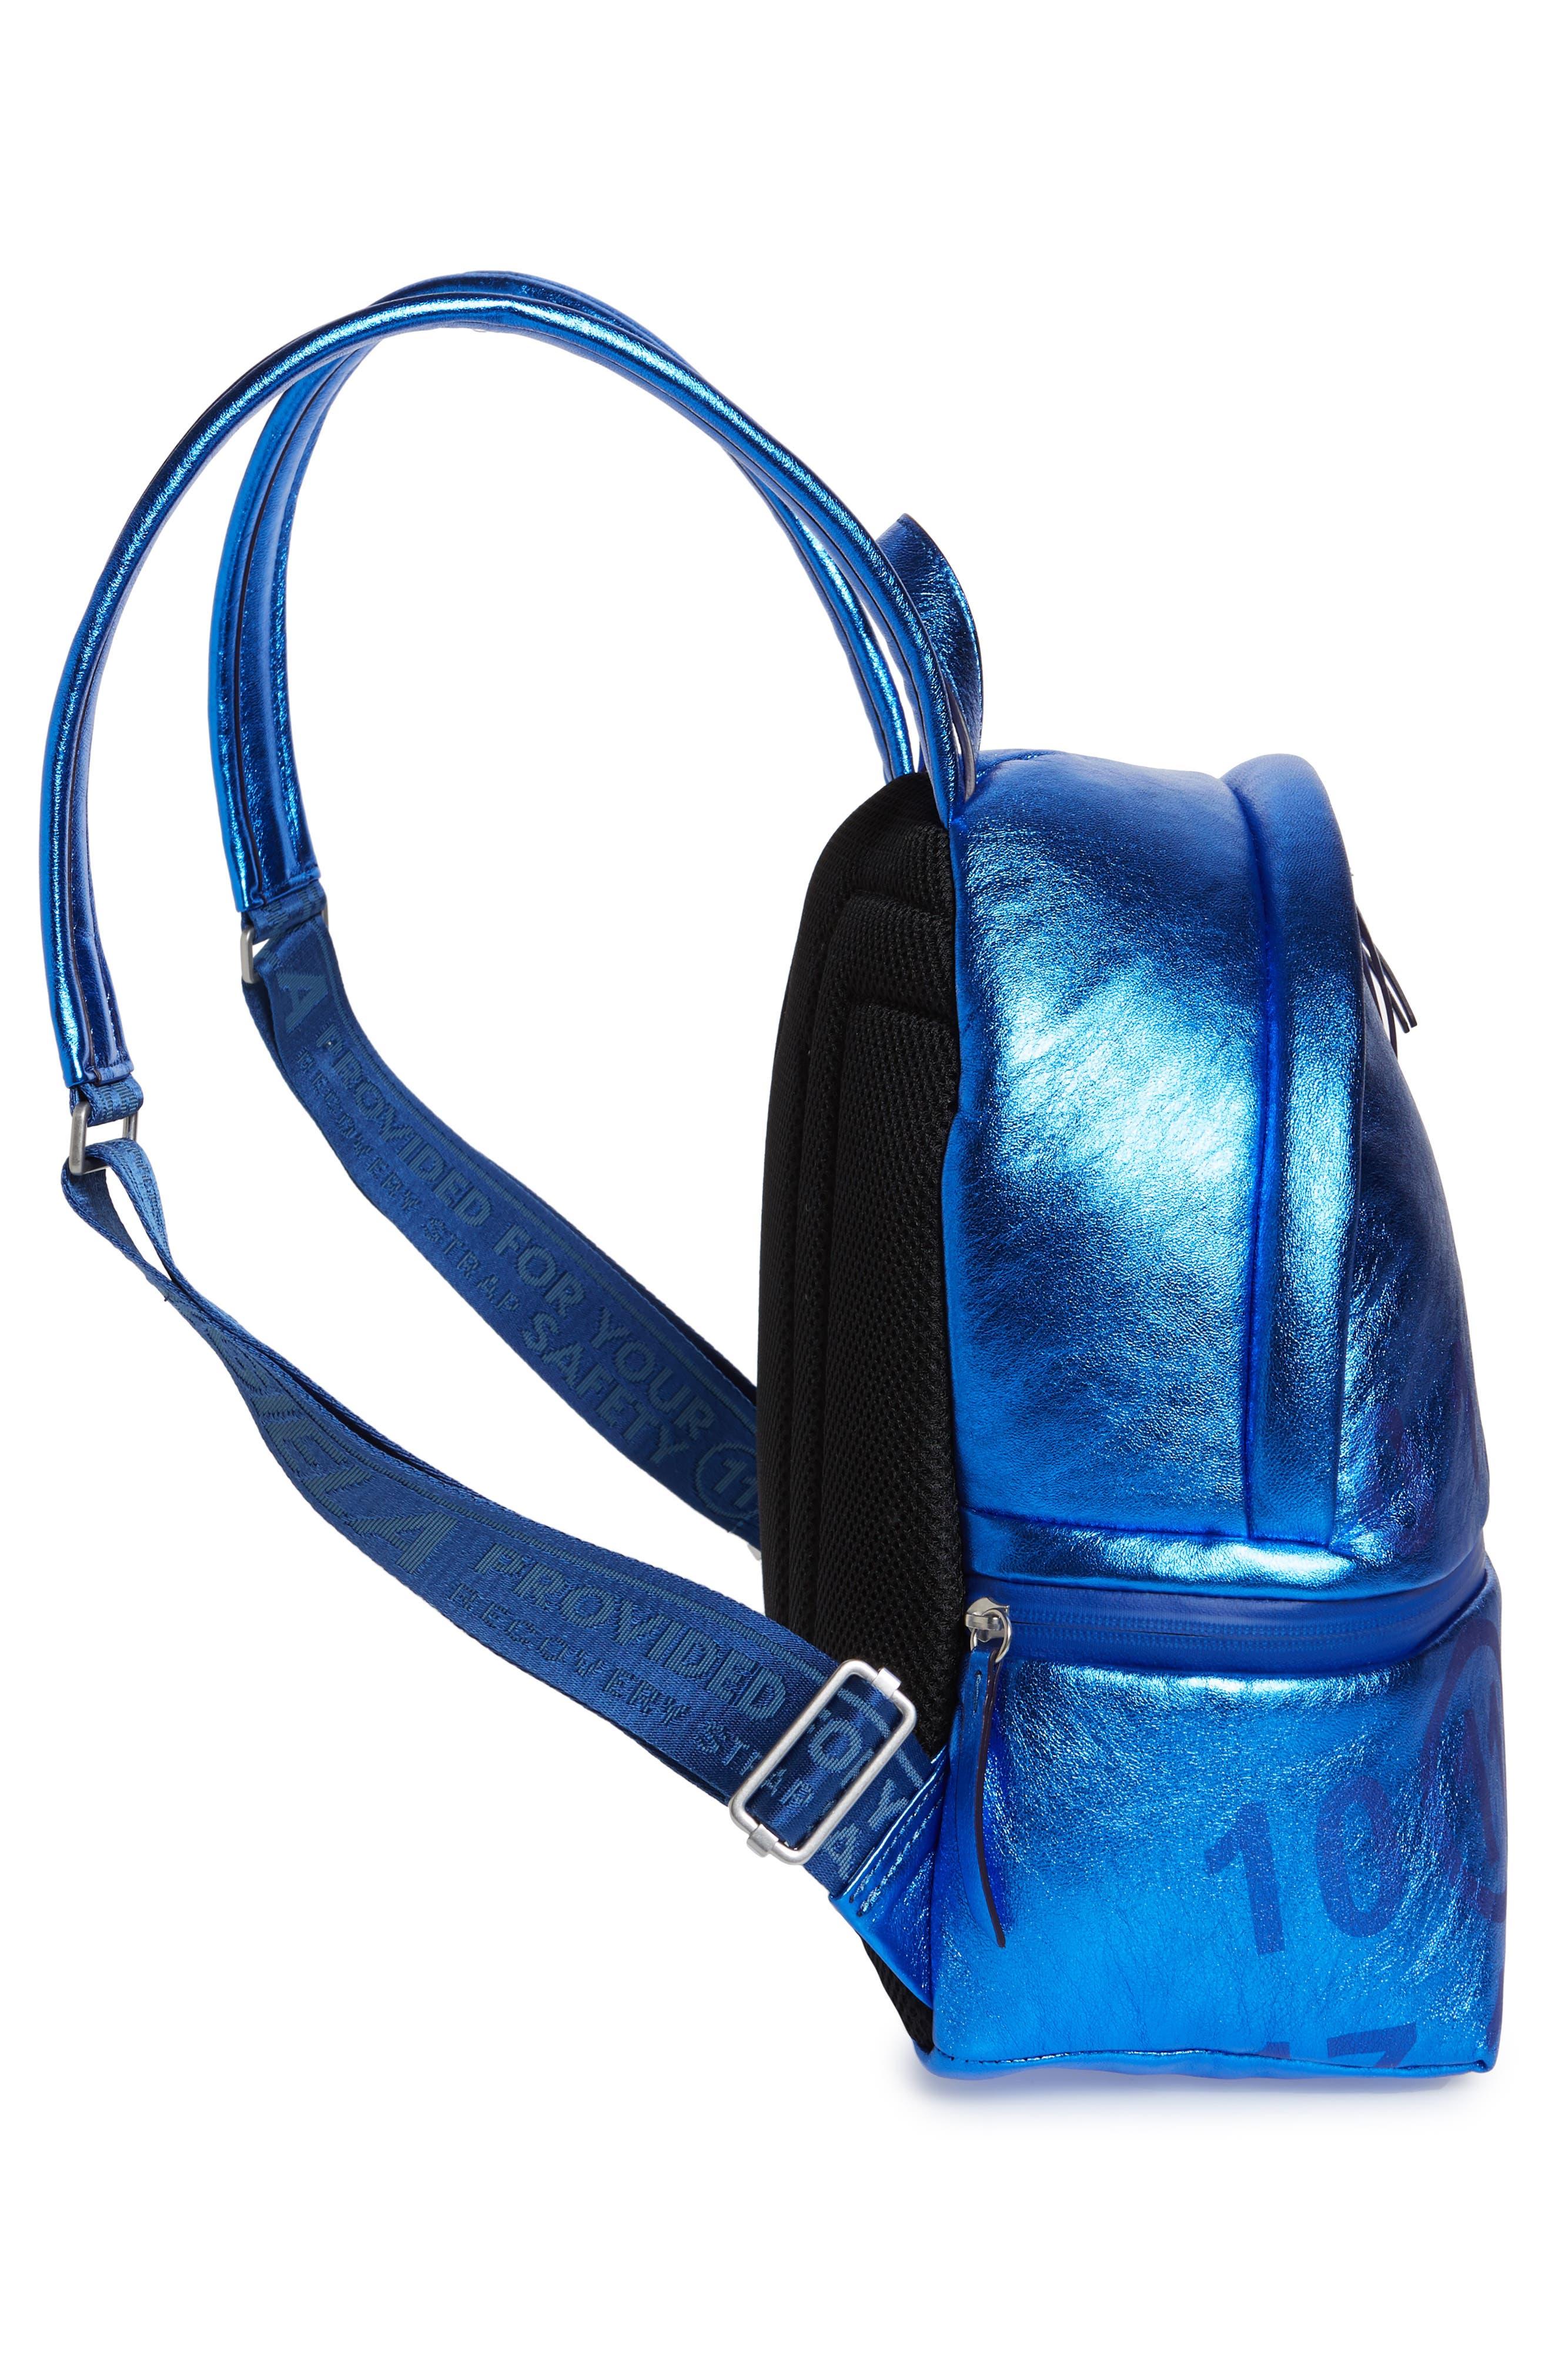 MAISON MARGIELA,                             Medium Number Print Backpack,                             Alternate thumbnail 5, color,                             DAZZLING BLUE